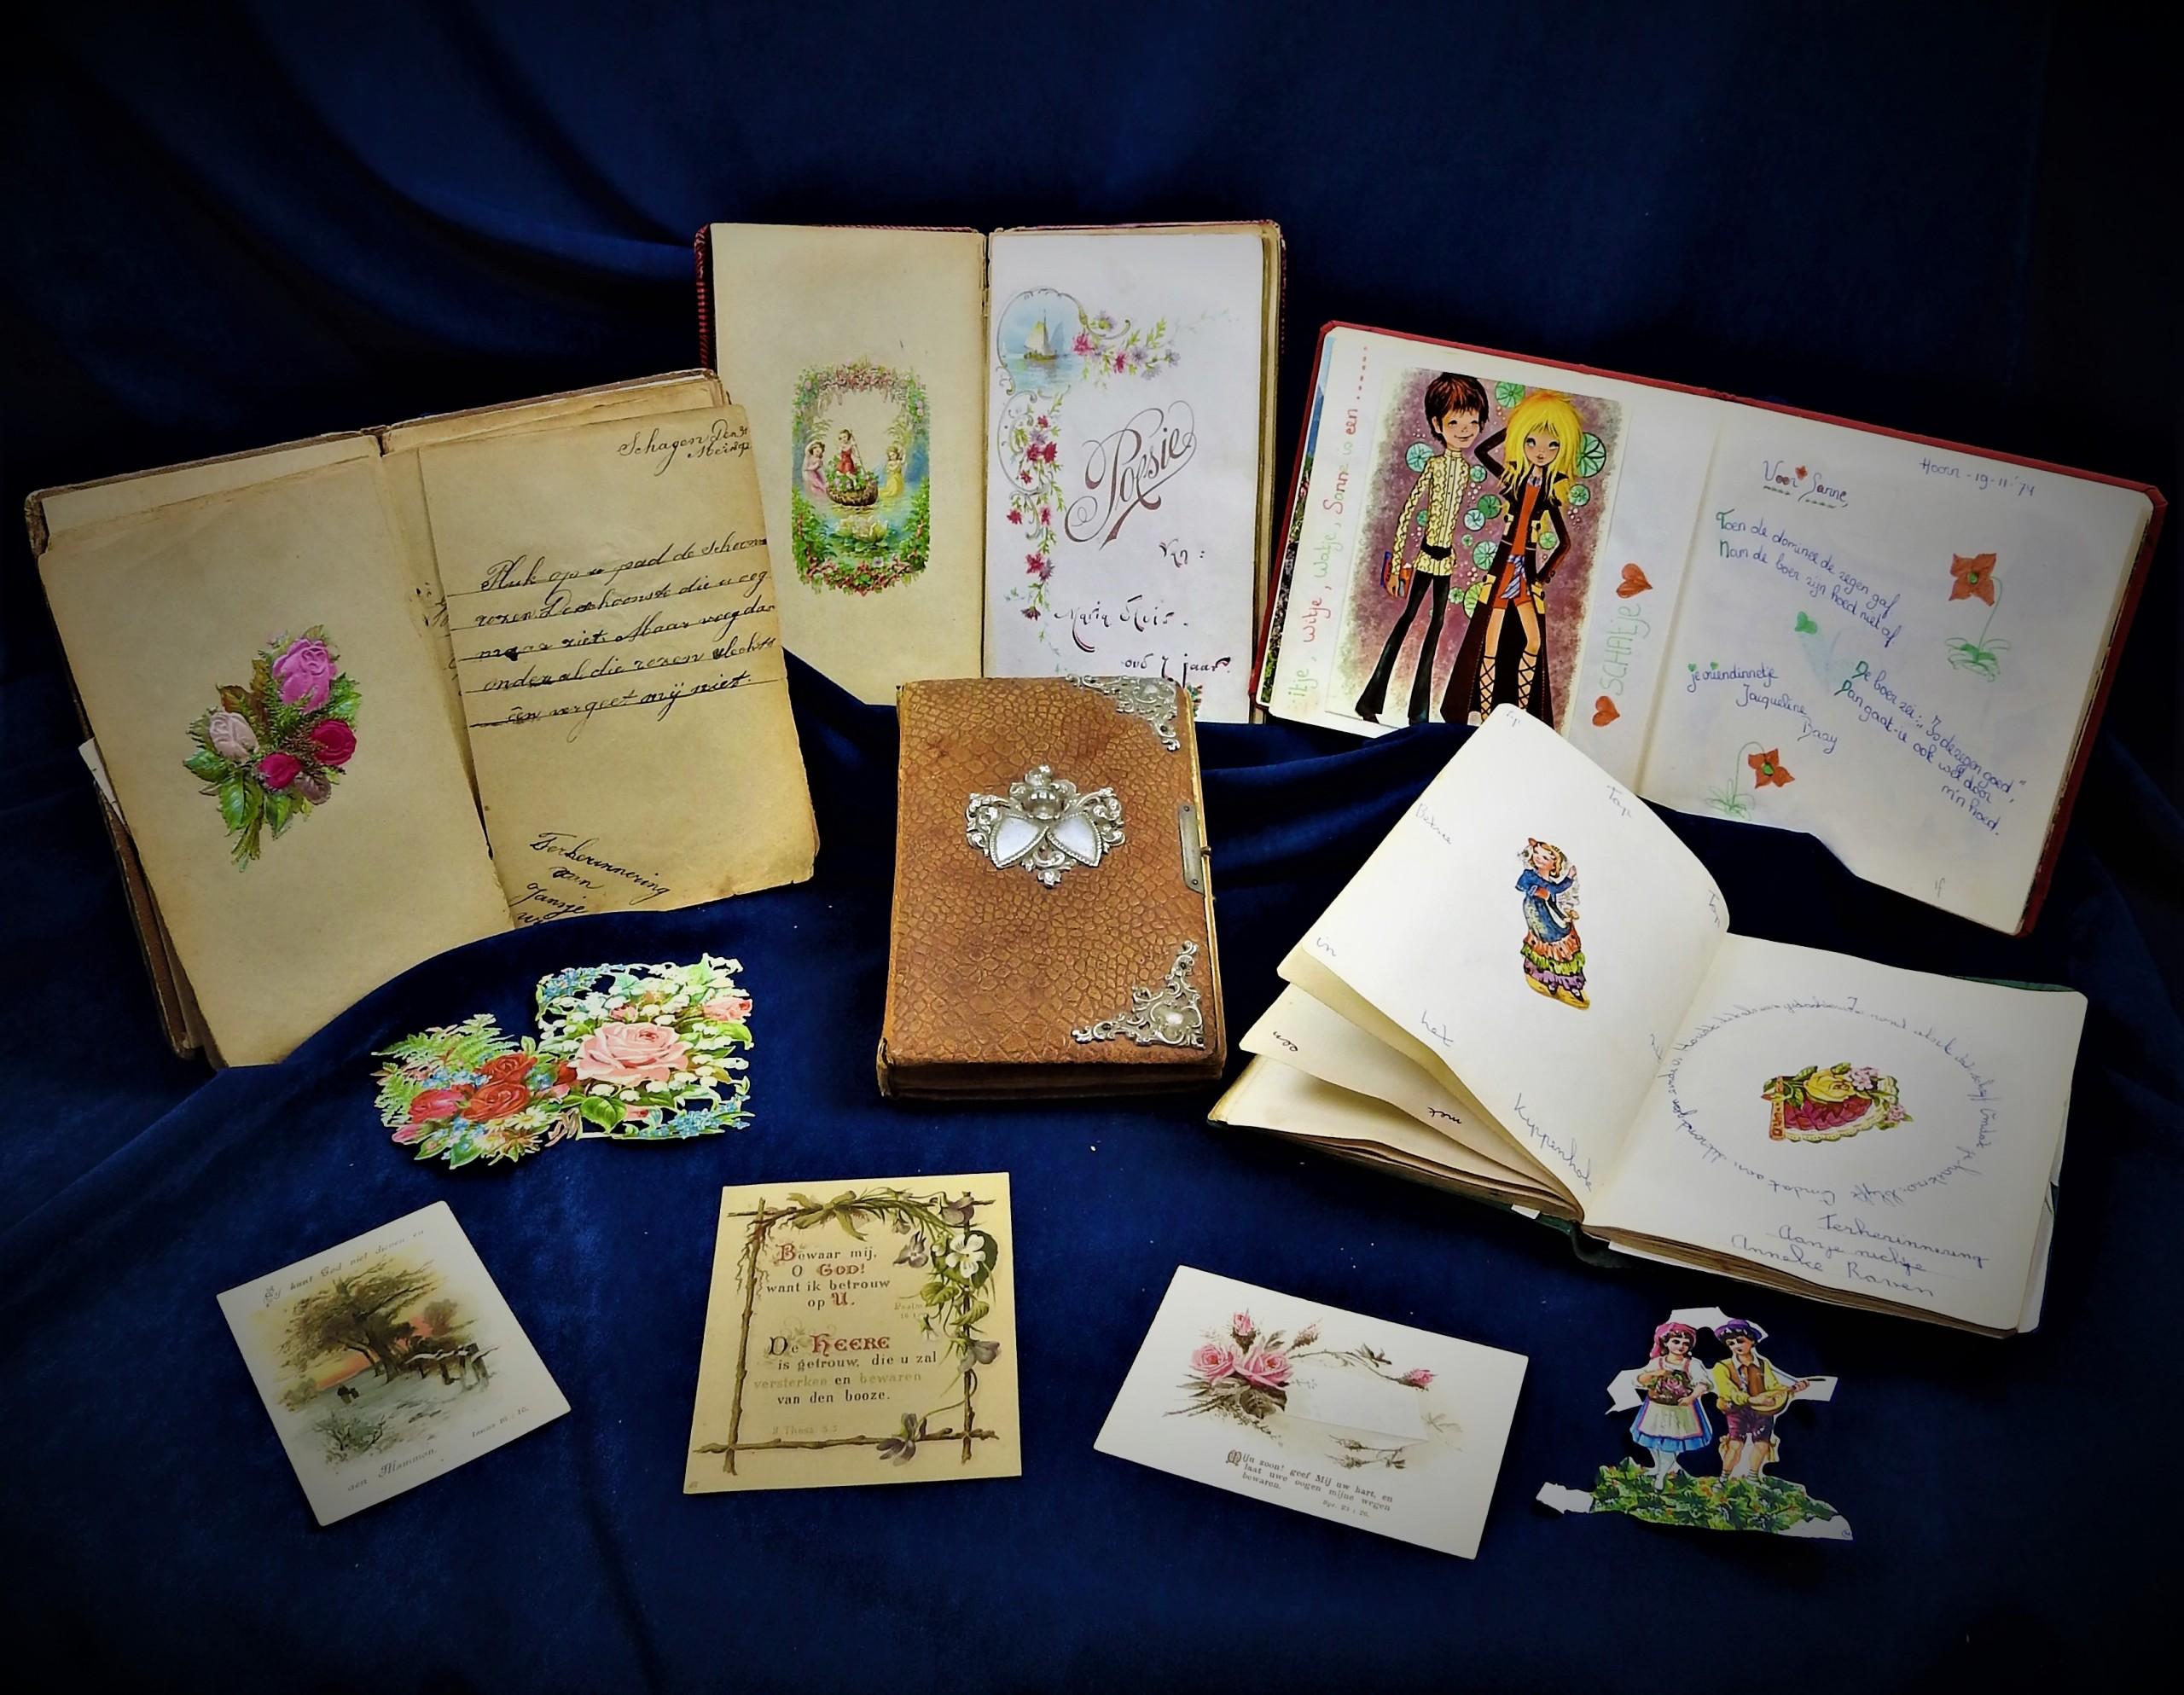 Poesie-/poëziealbums